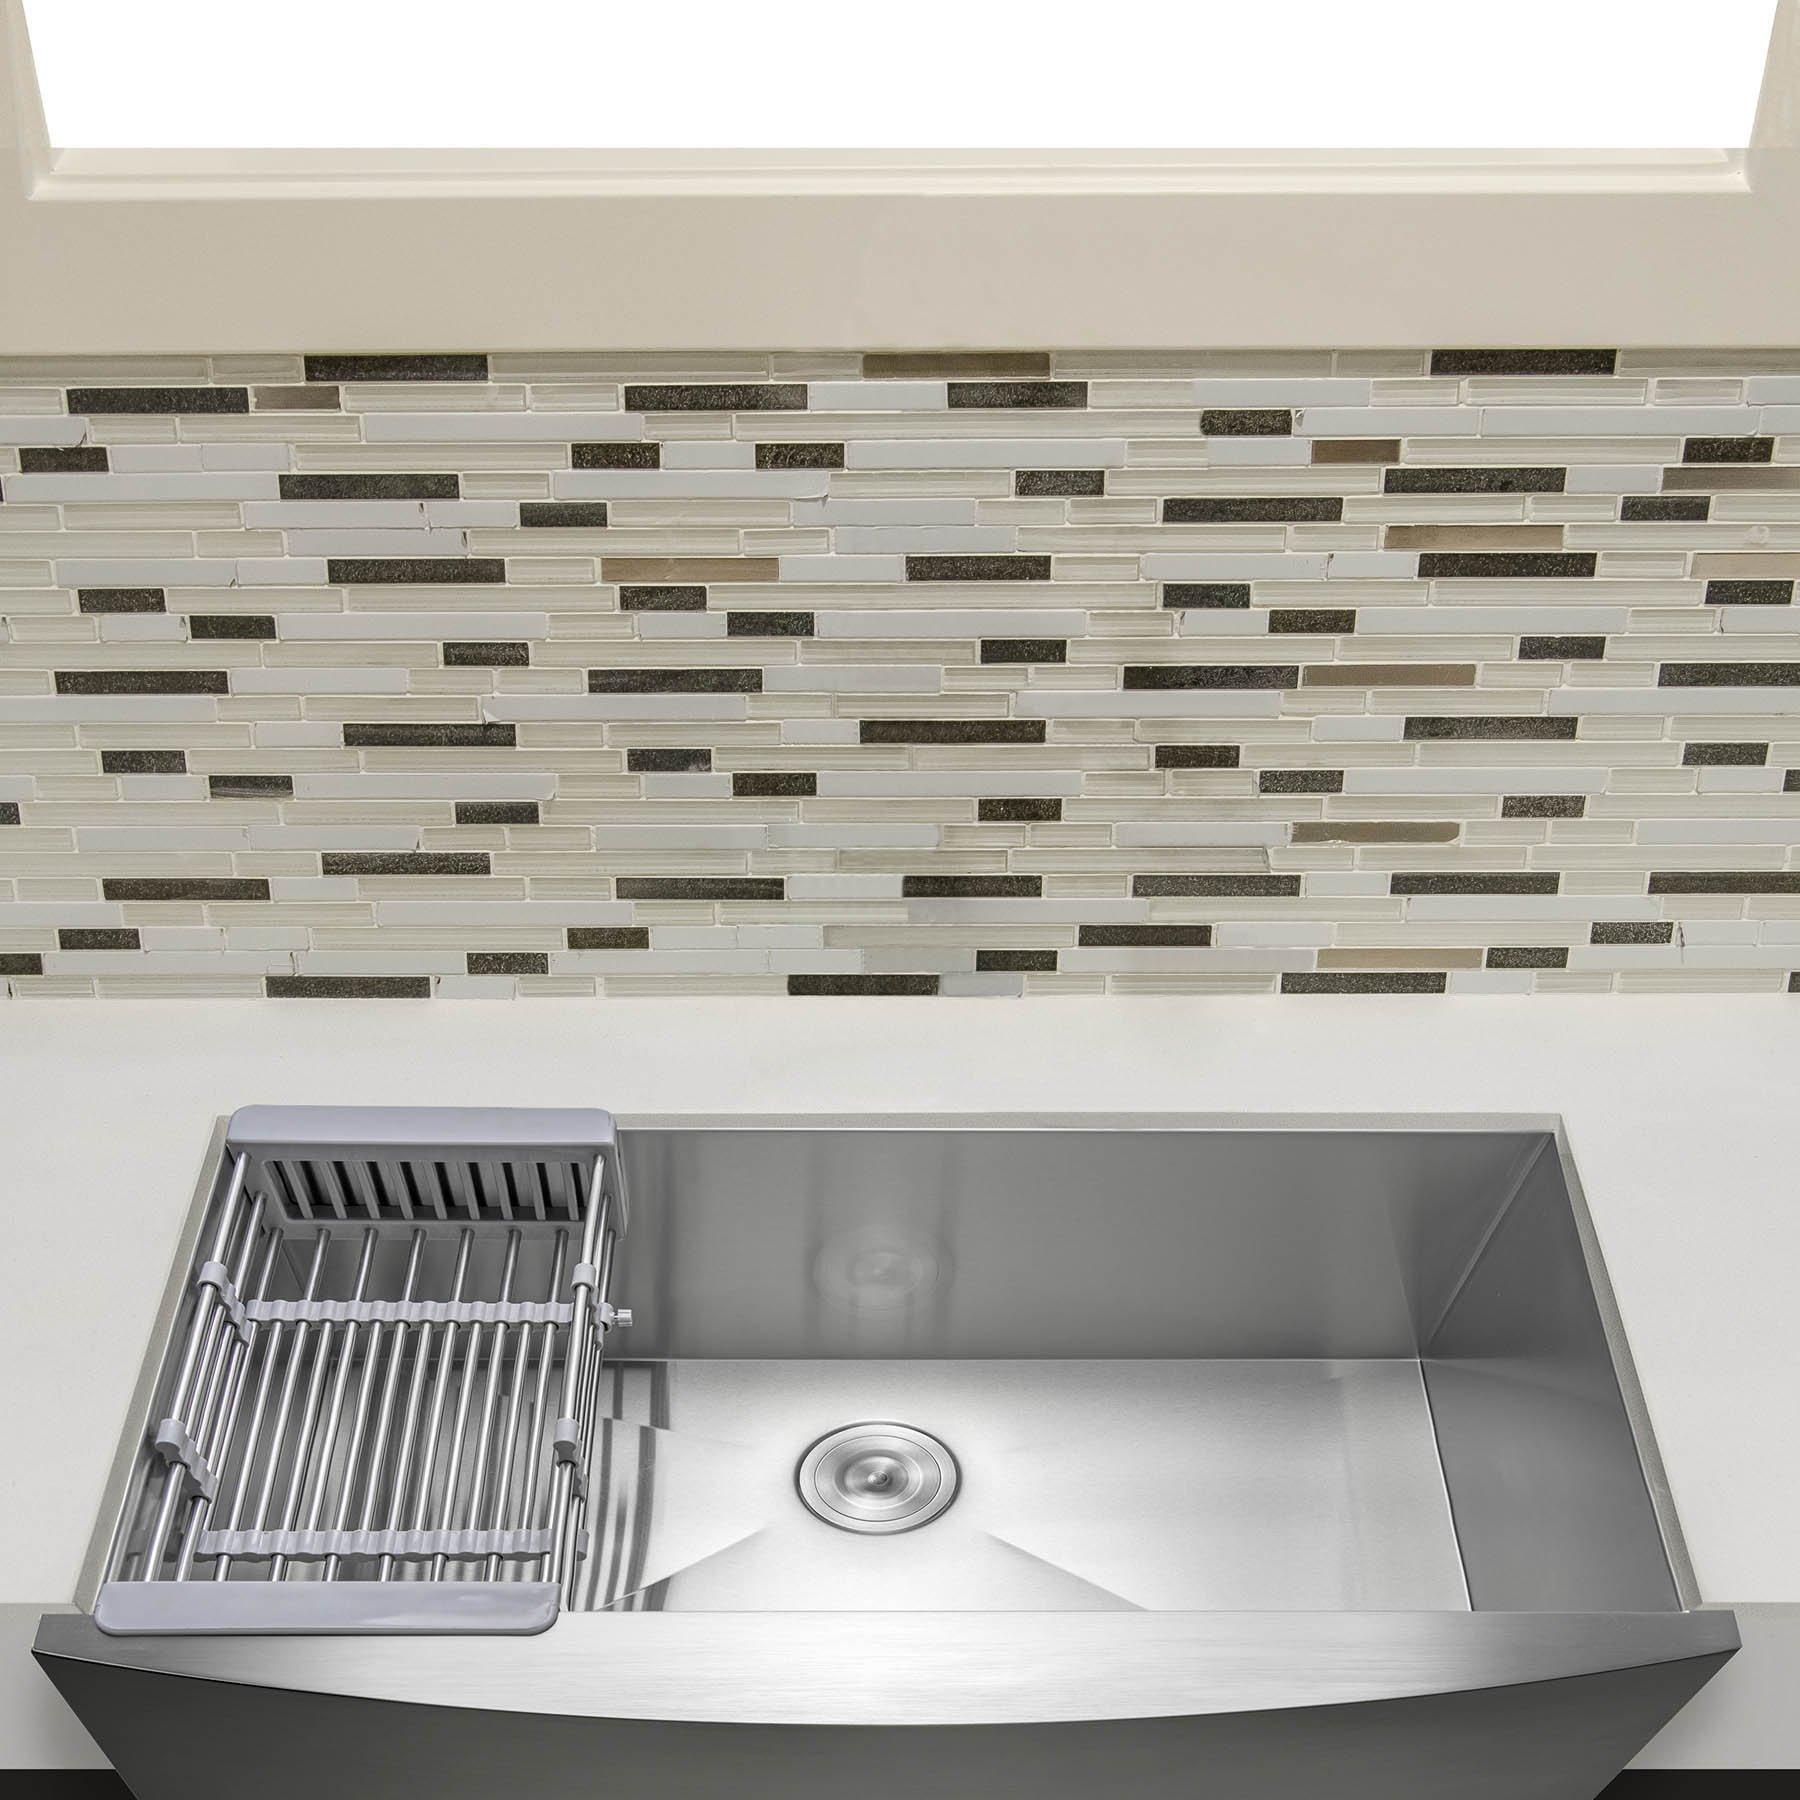 Firebird 30'' x 20'' x 9'' Apron Farmhouse Handmade Stainless Steel Single Bowl Kitchen Sink w/ Drain Strainer Kit Adjustable Tray